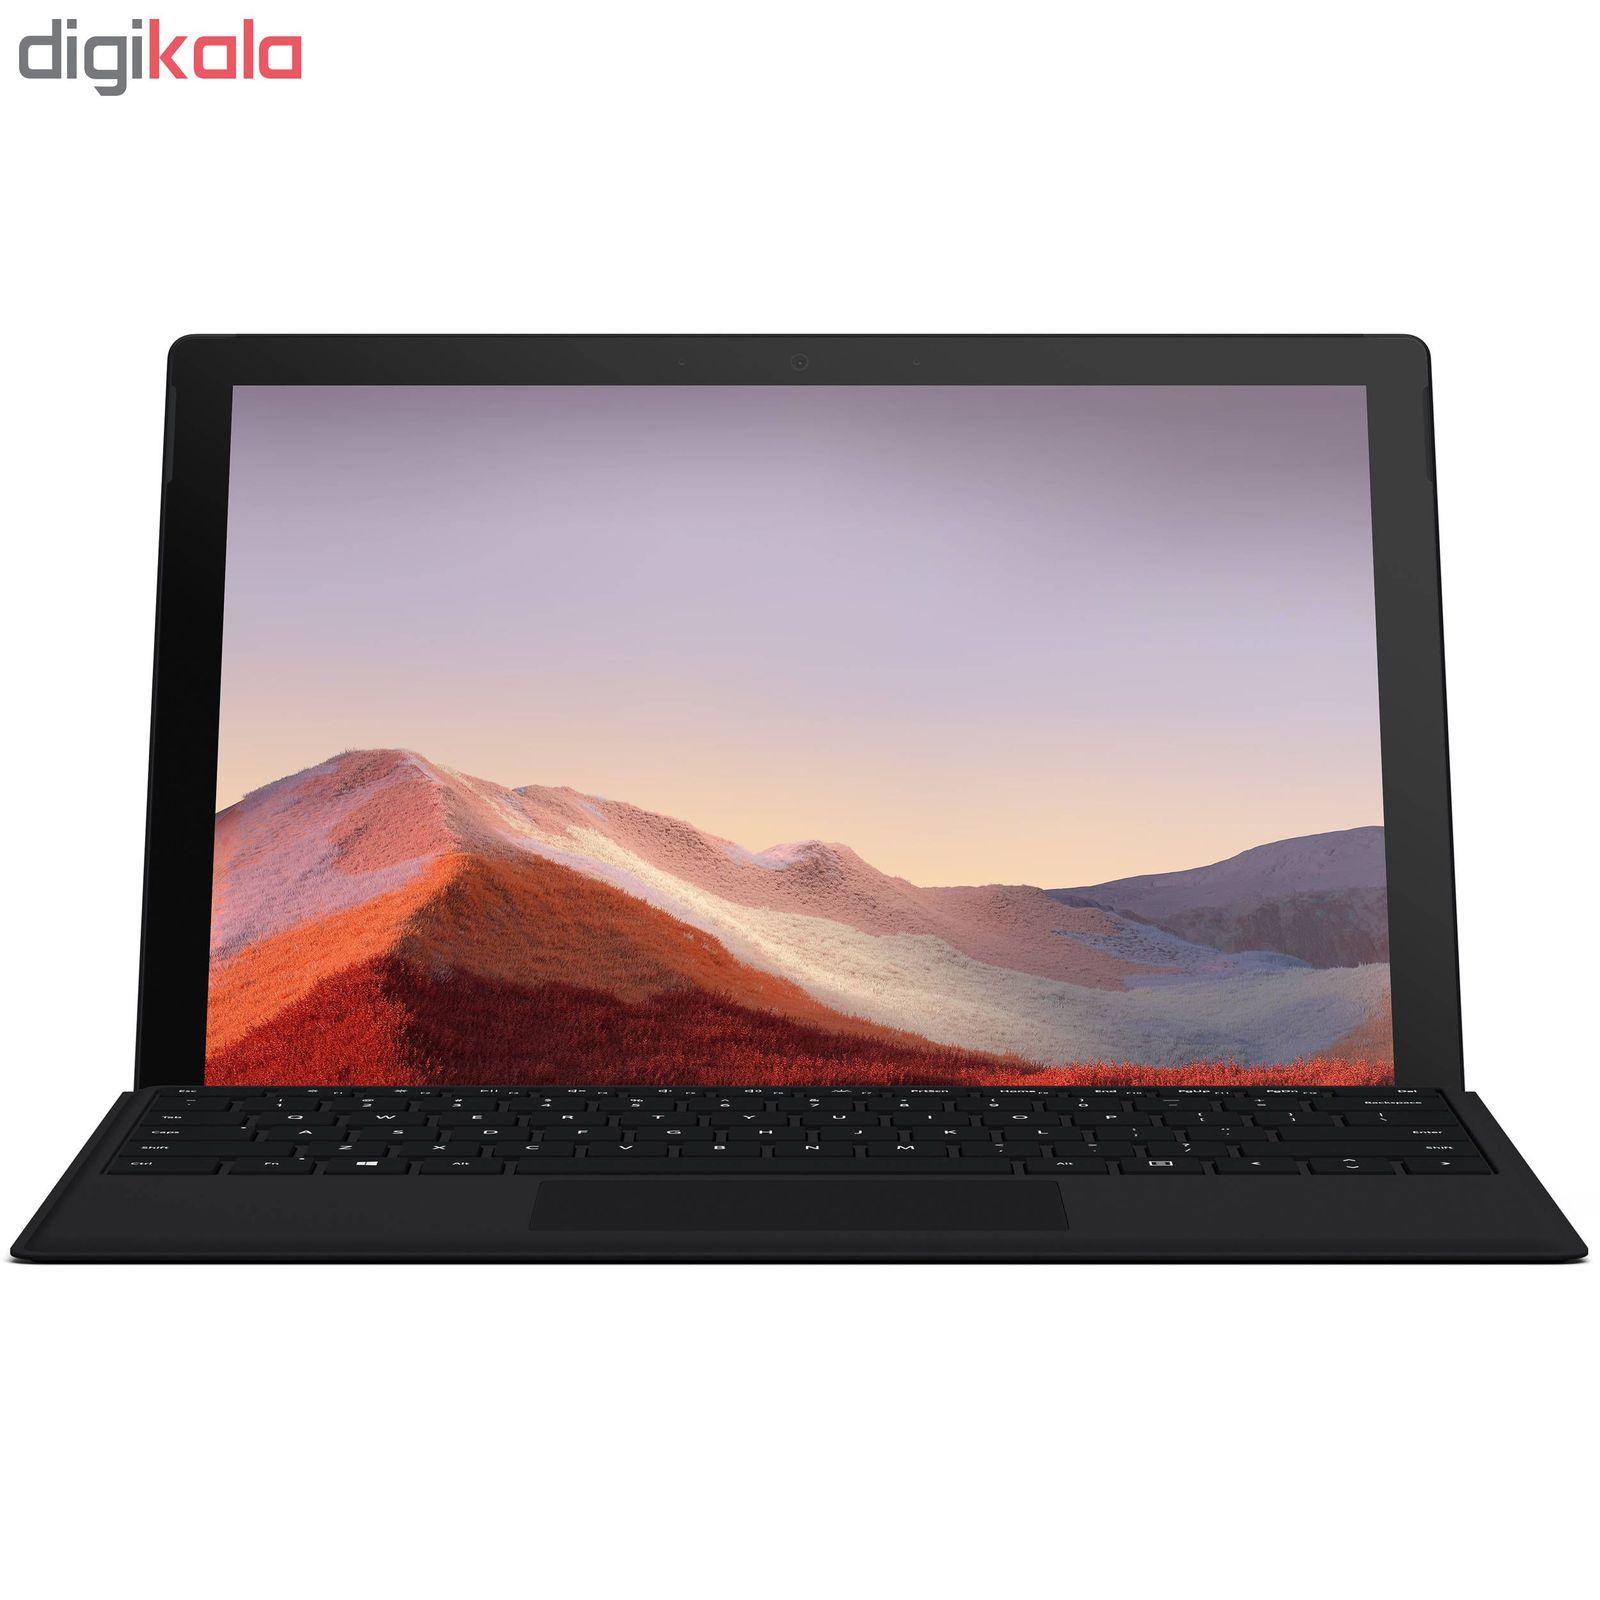 تبلت مایکروسافت مدل Surface Pro 7 - B به همراه کیبورد Black Type Cover main 1 1